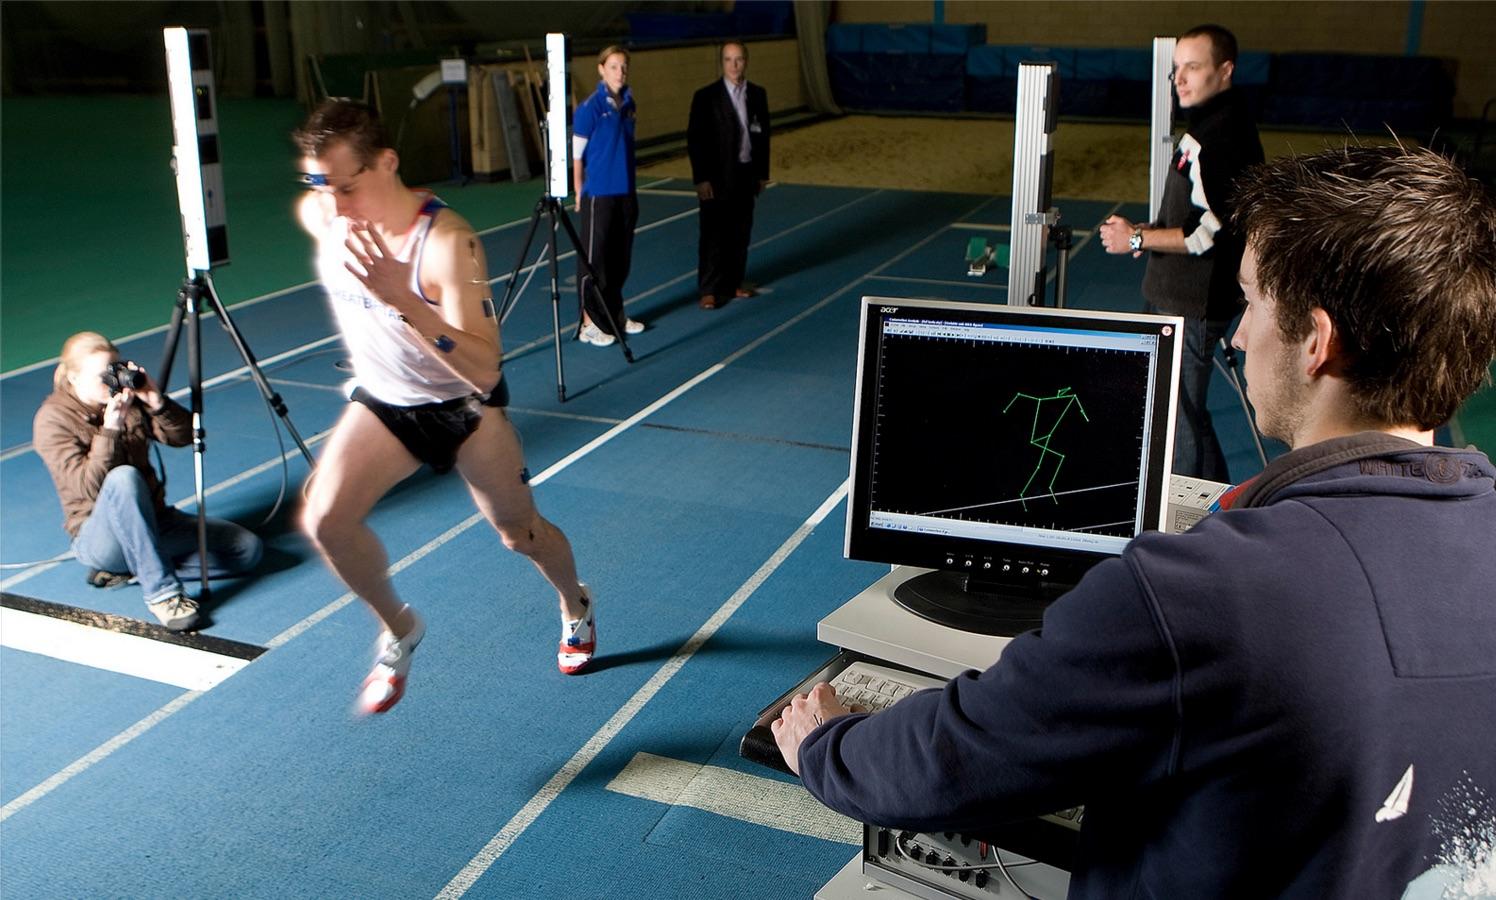 технологии спорта